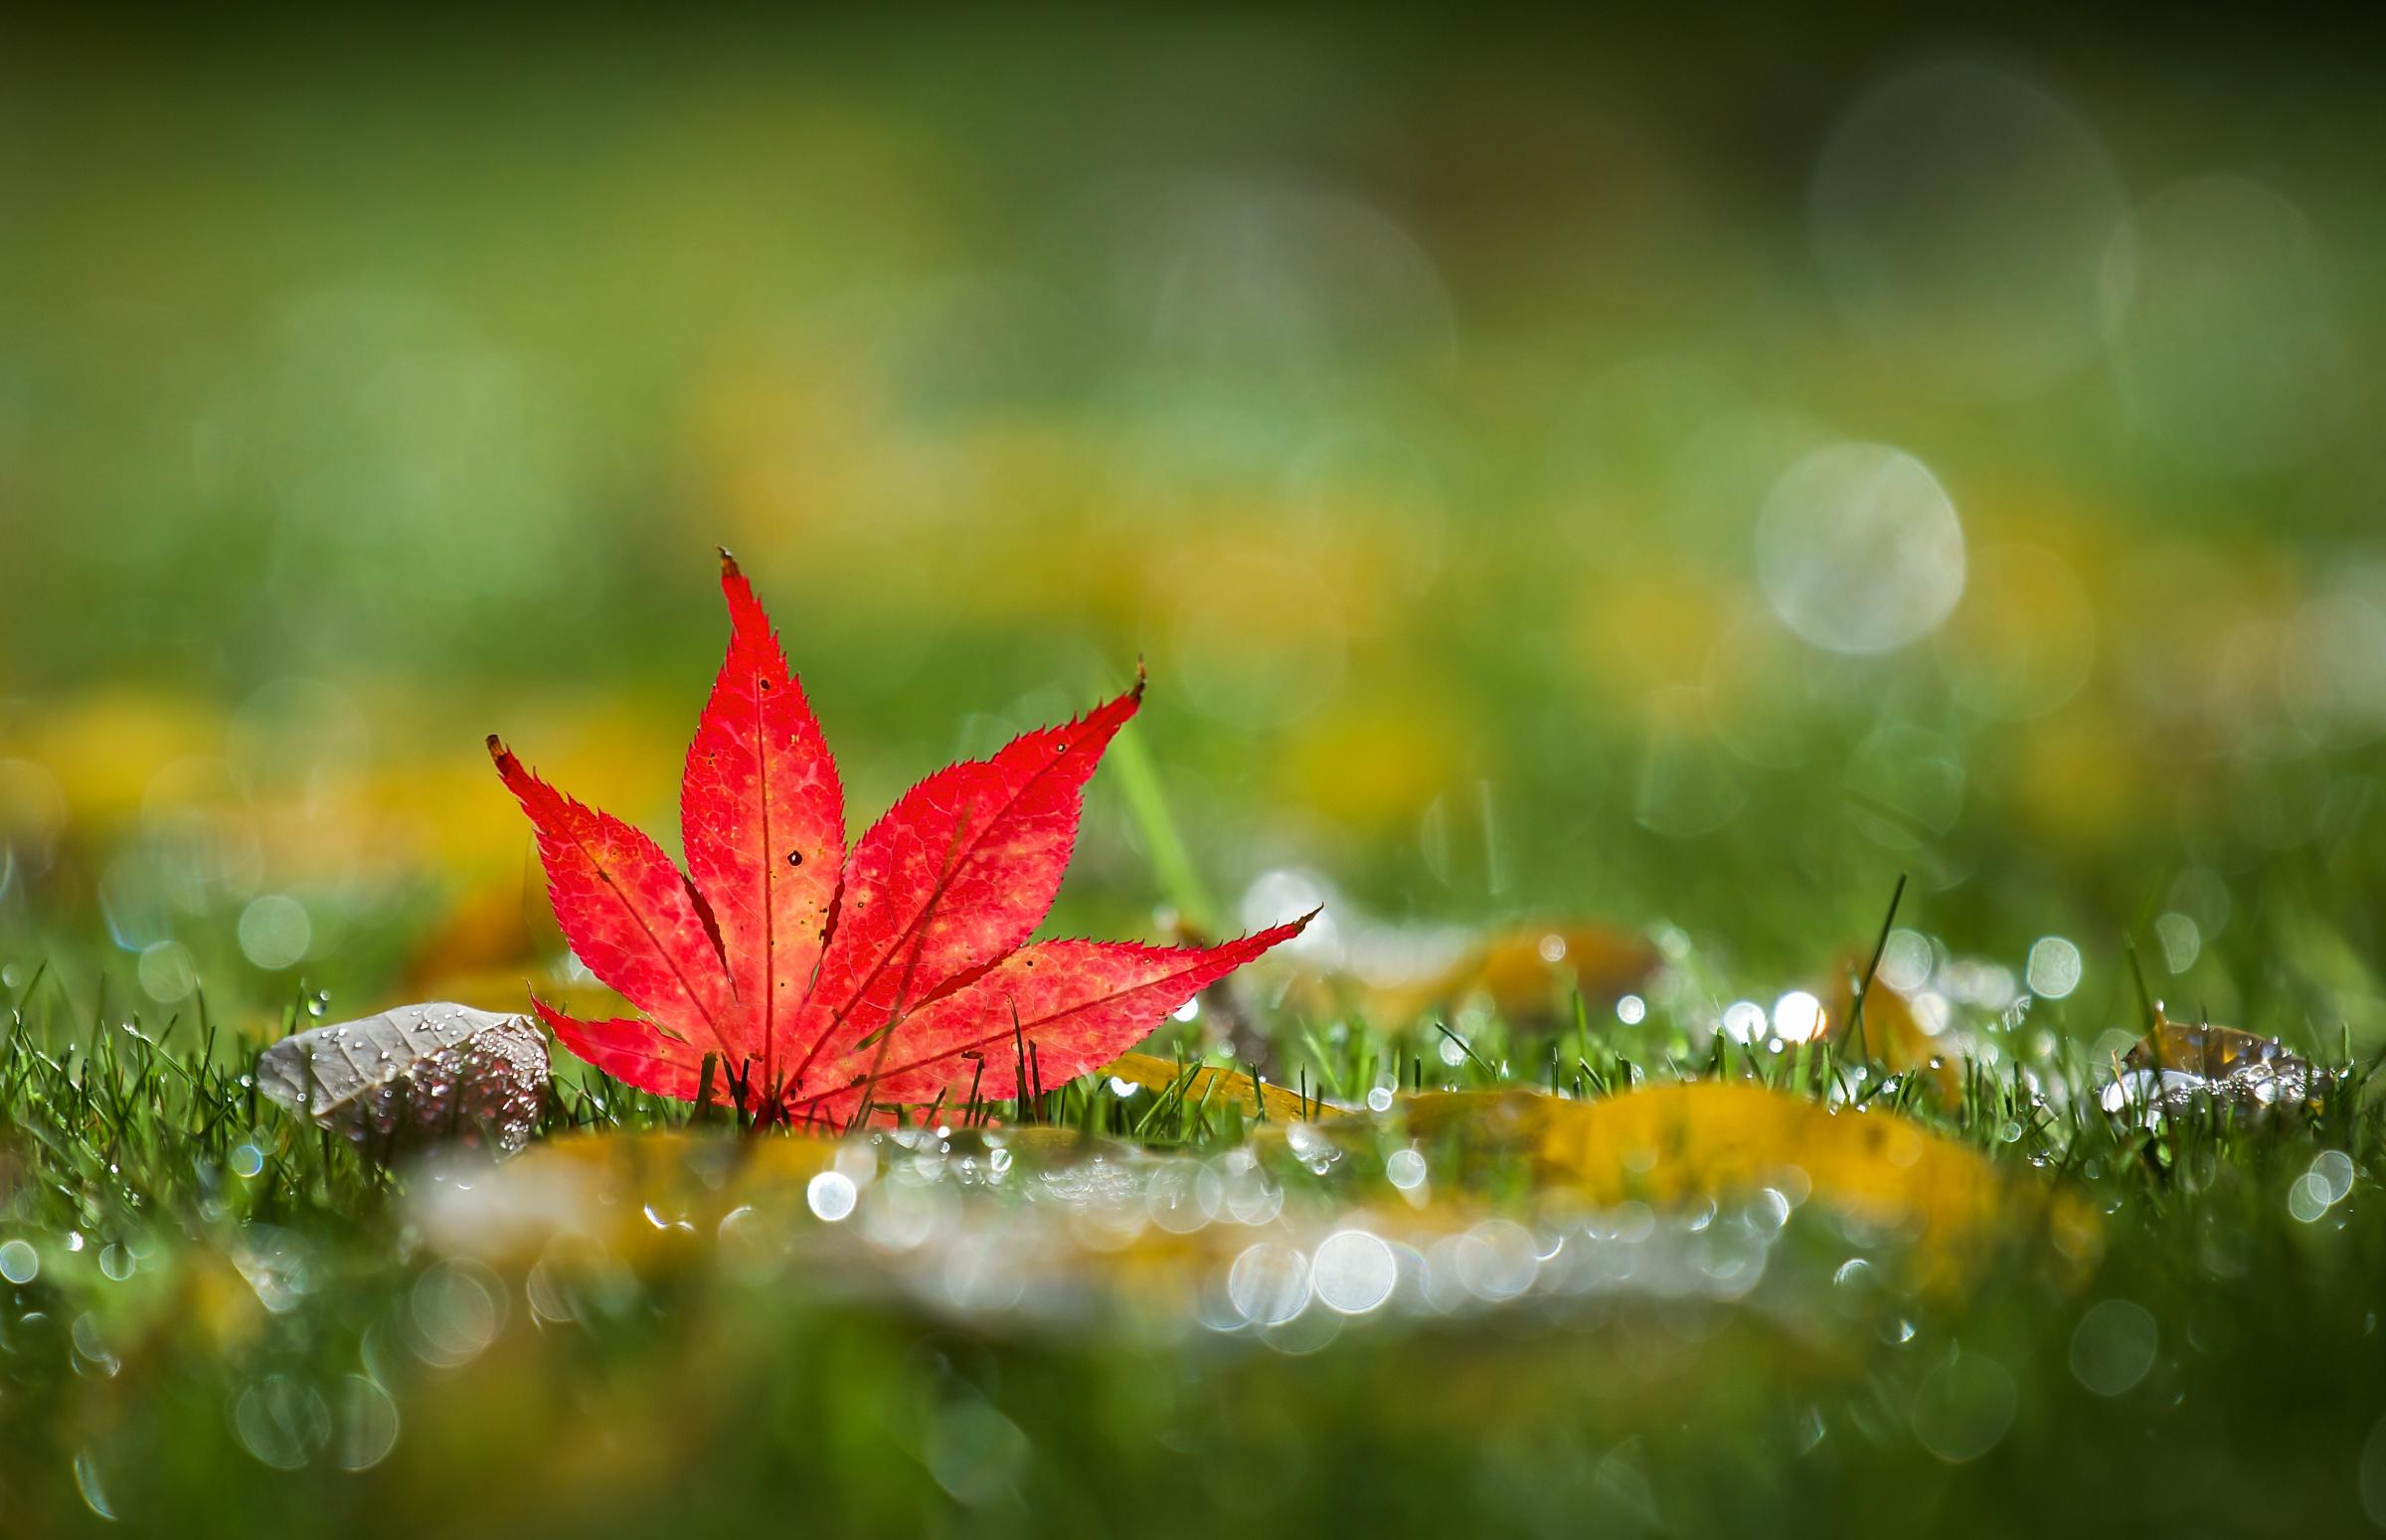 leaf hd wallpaper | background image | 2400x1549 | id:707163